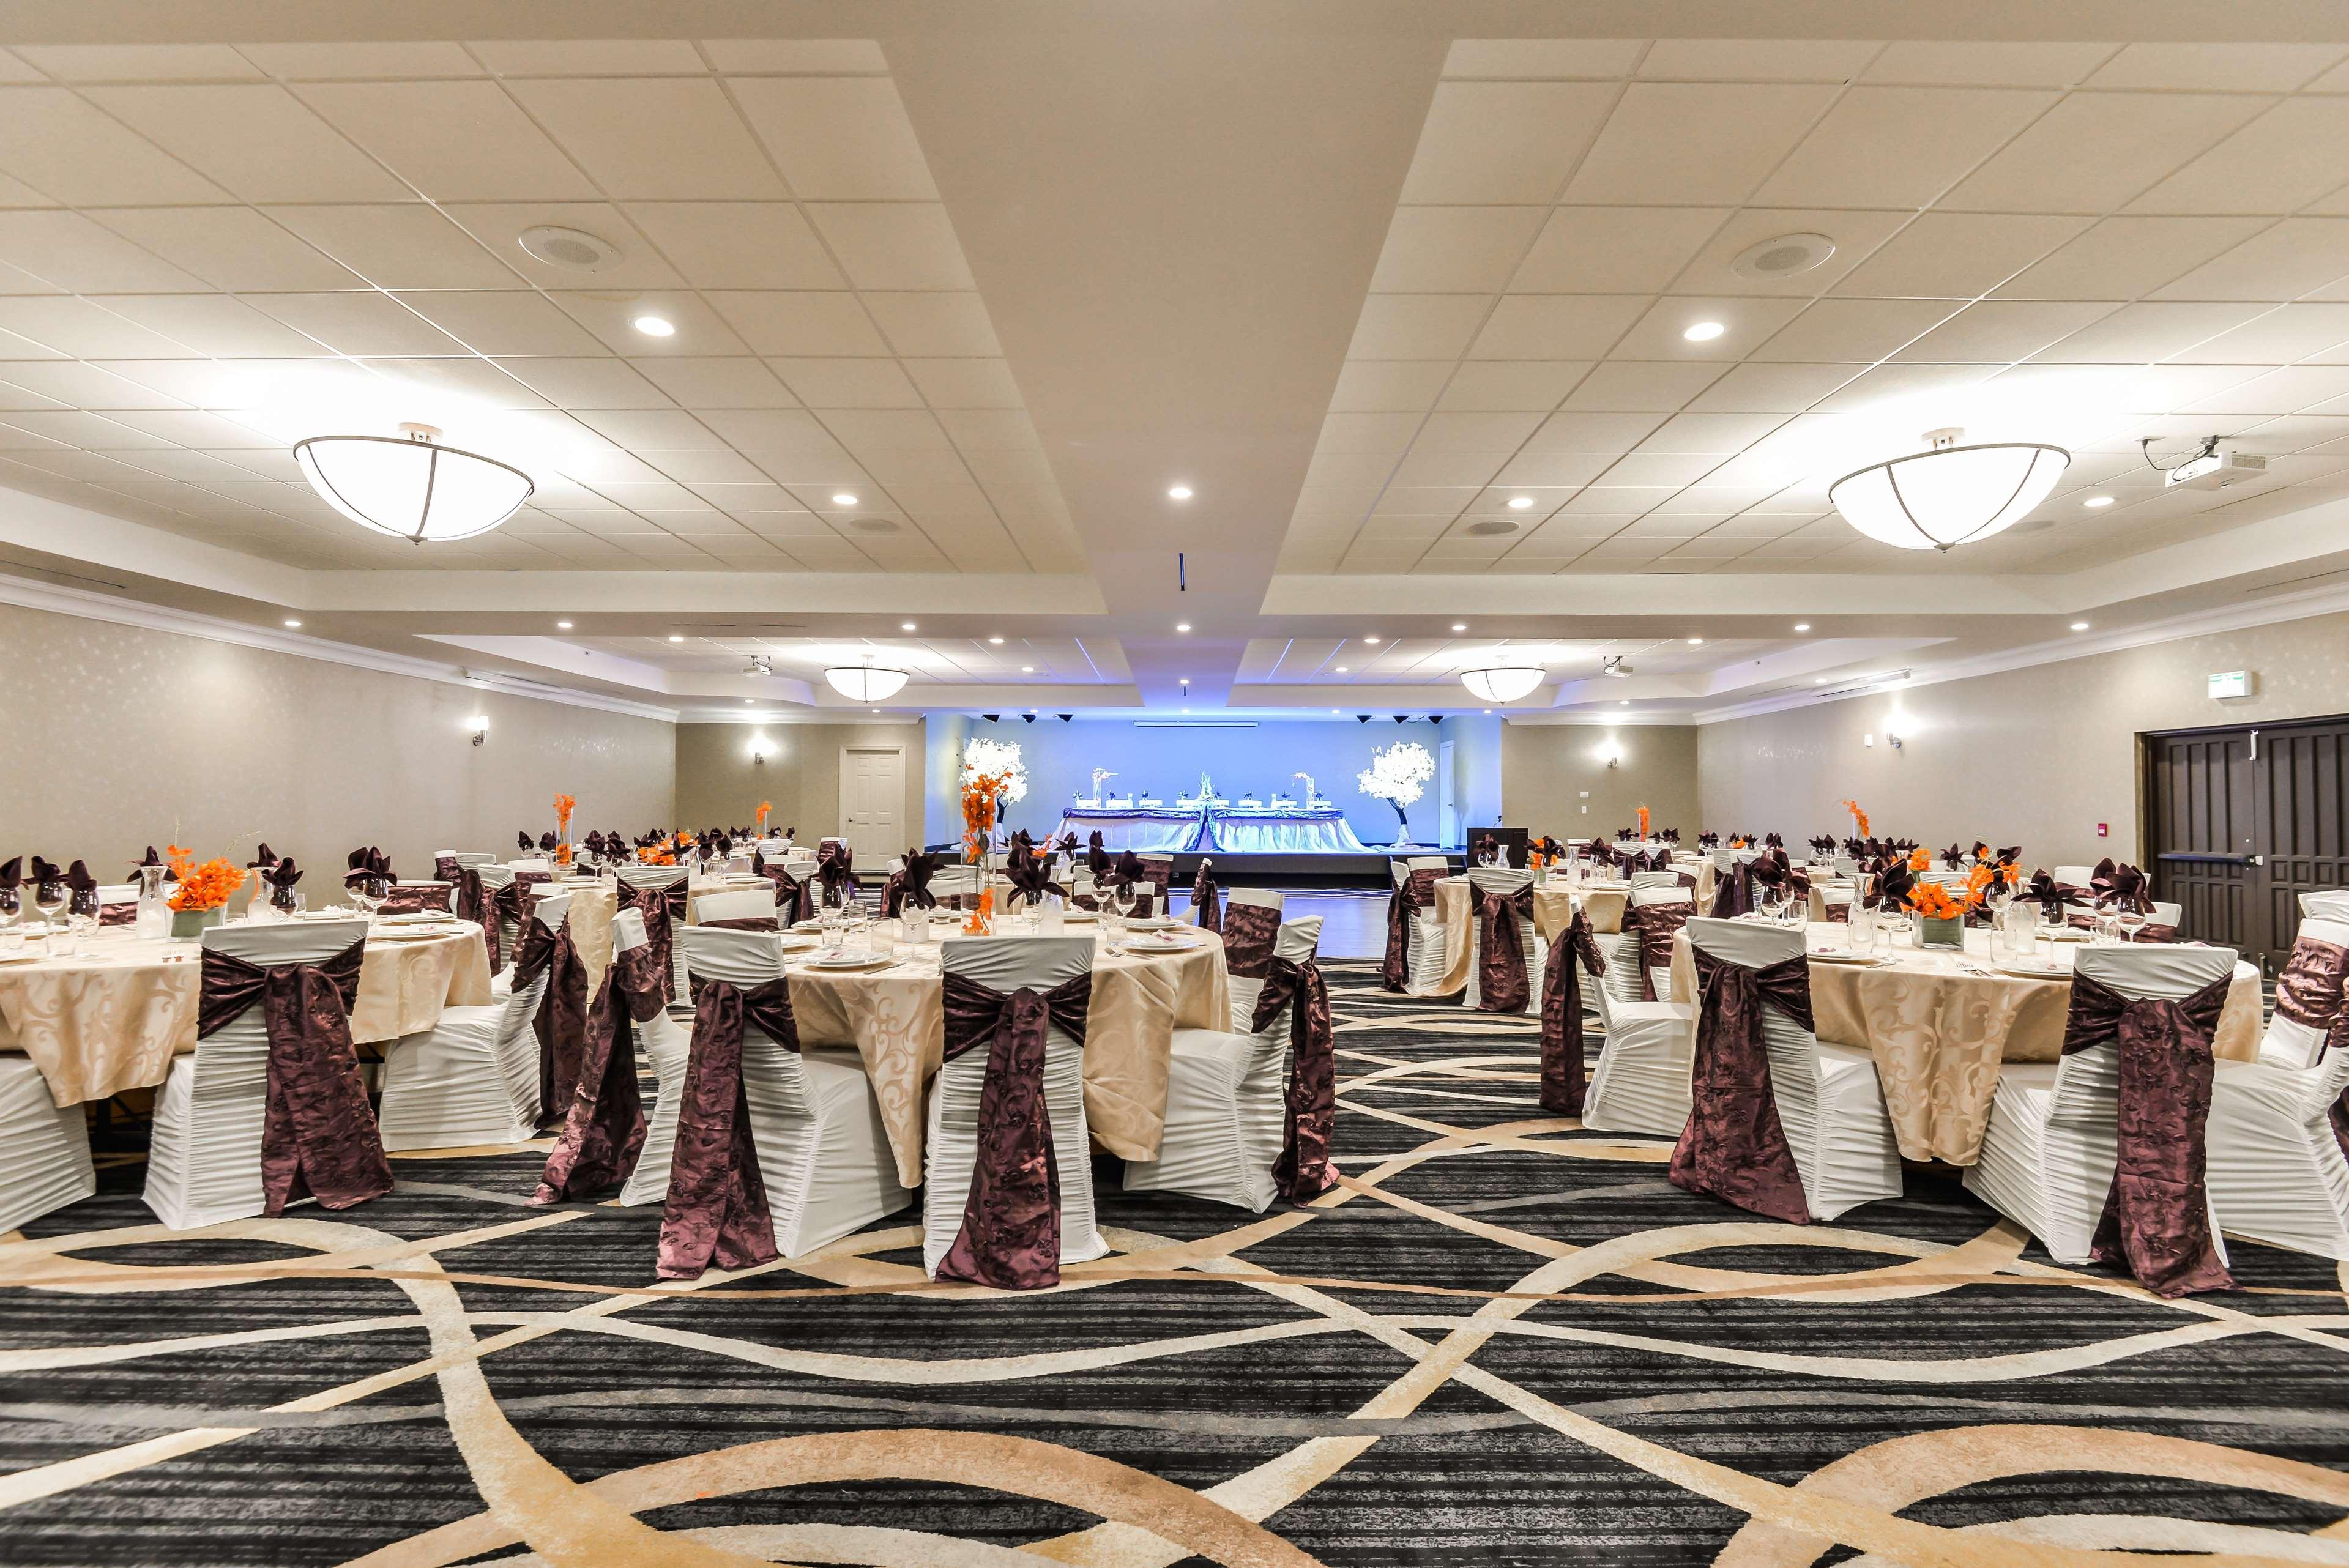 Banquet Room Best Western Plus Leamington Hotel & Conference Centre Leamington (519)326-8646